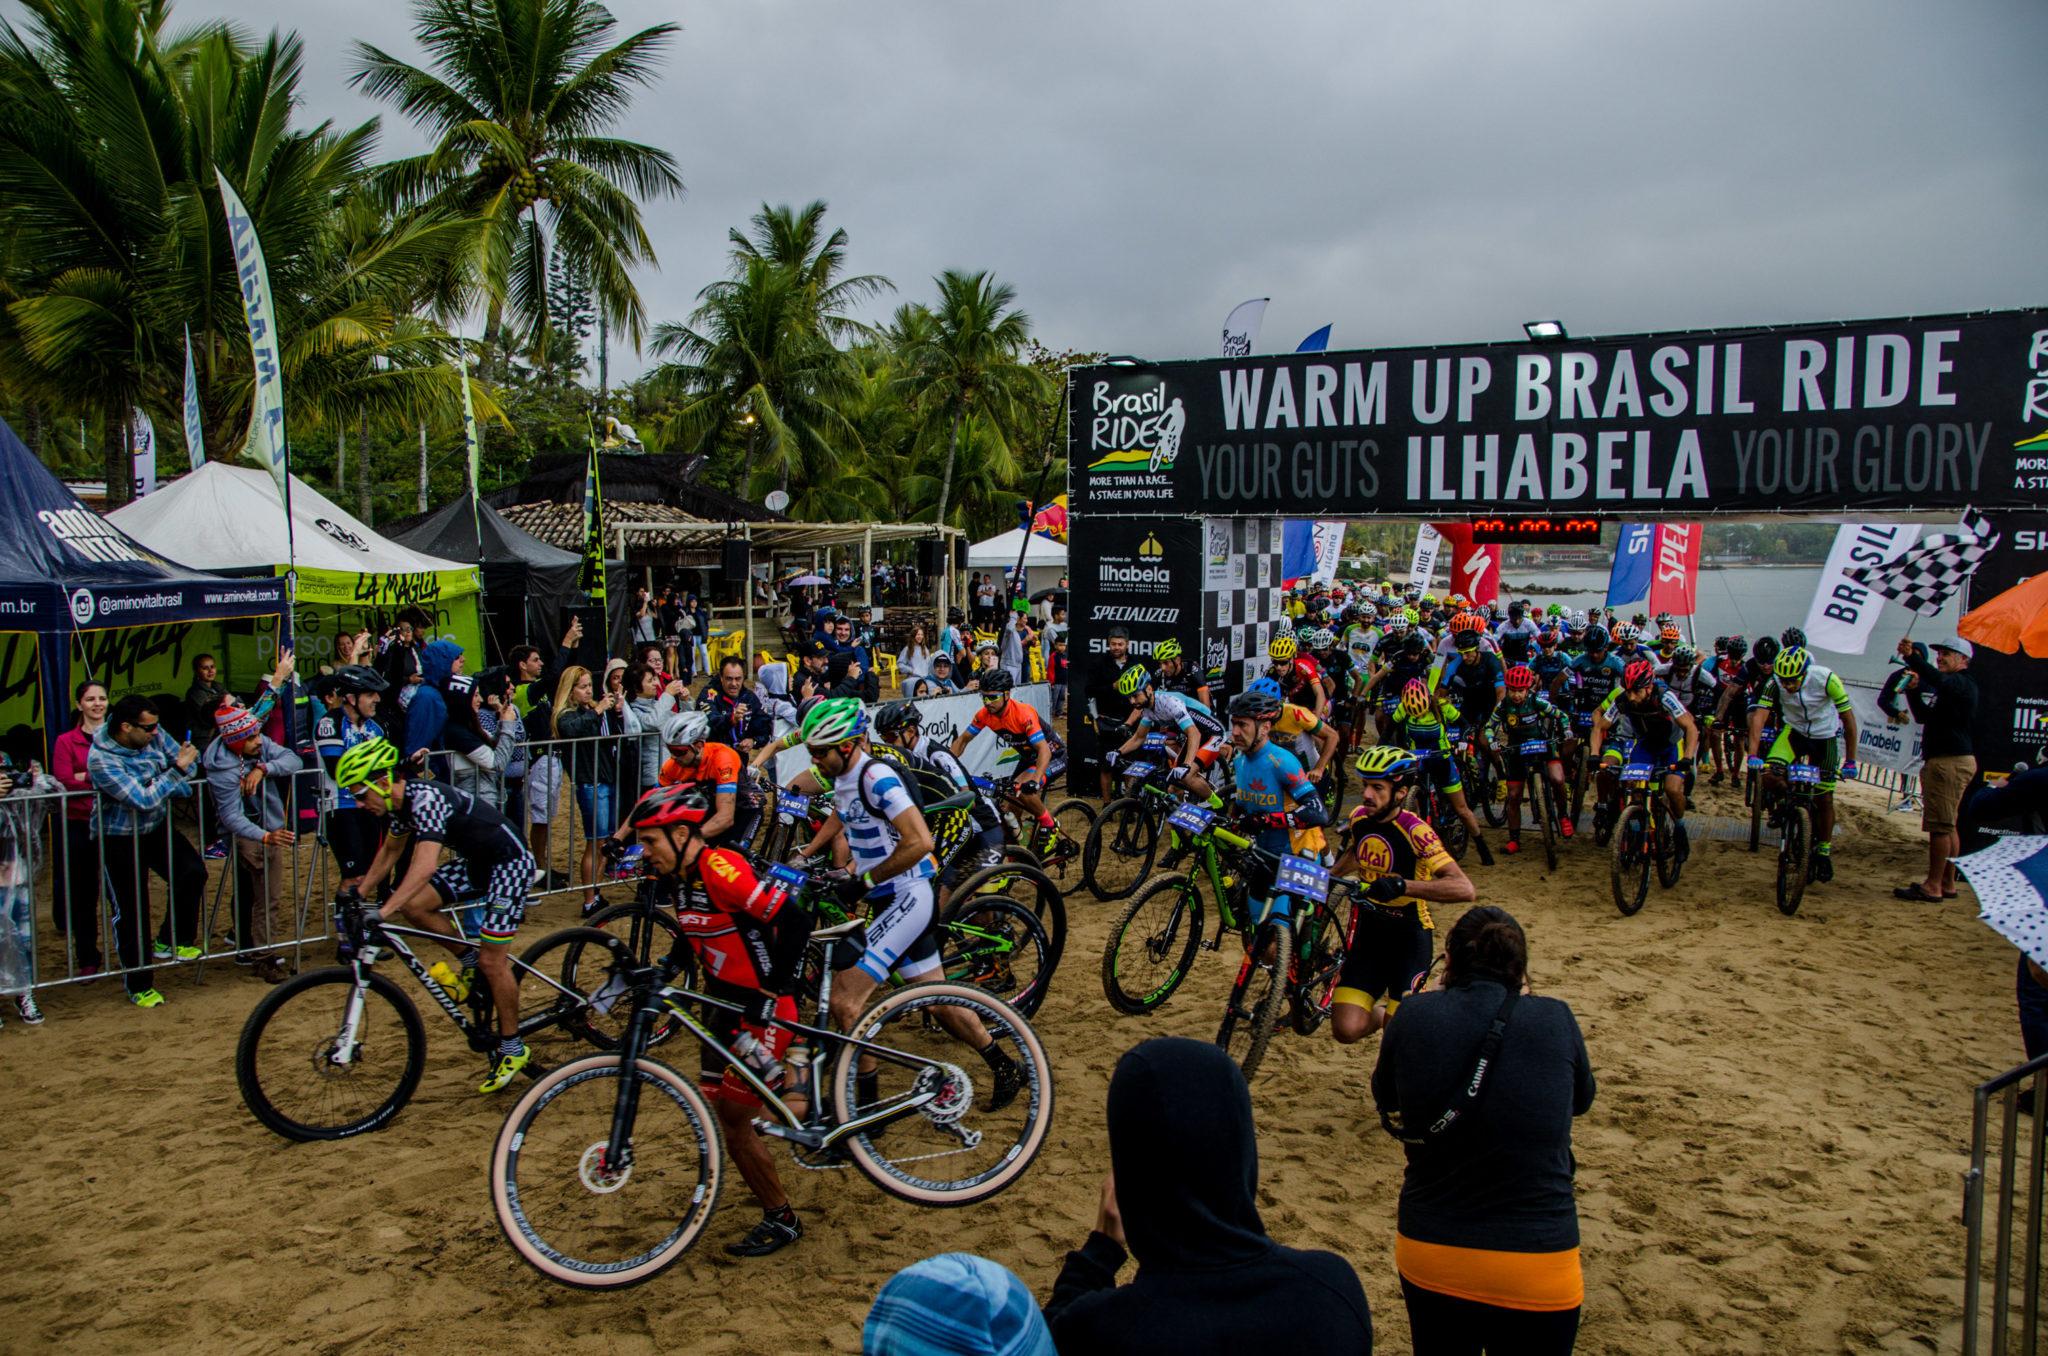 Largada na praia (Ney Evangelista / Brasil Ride